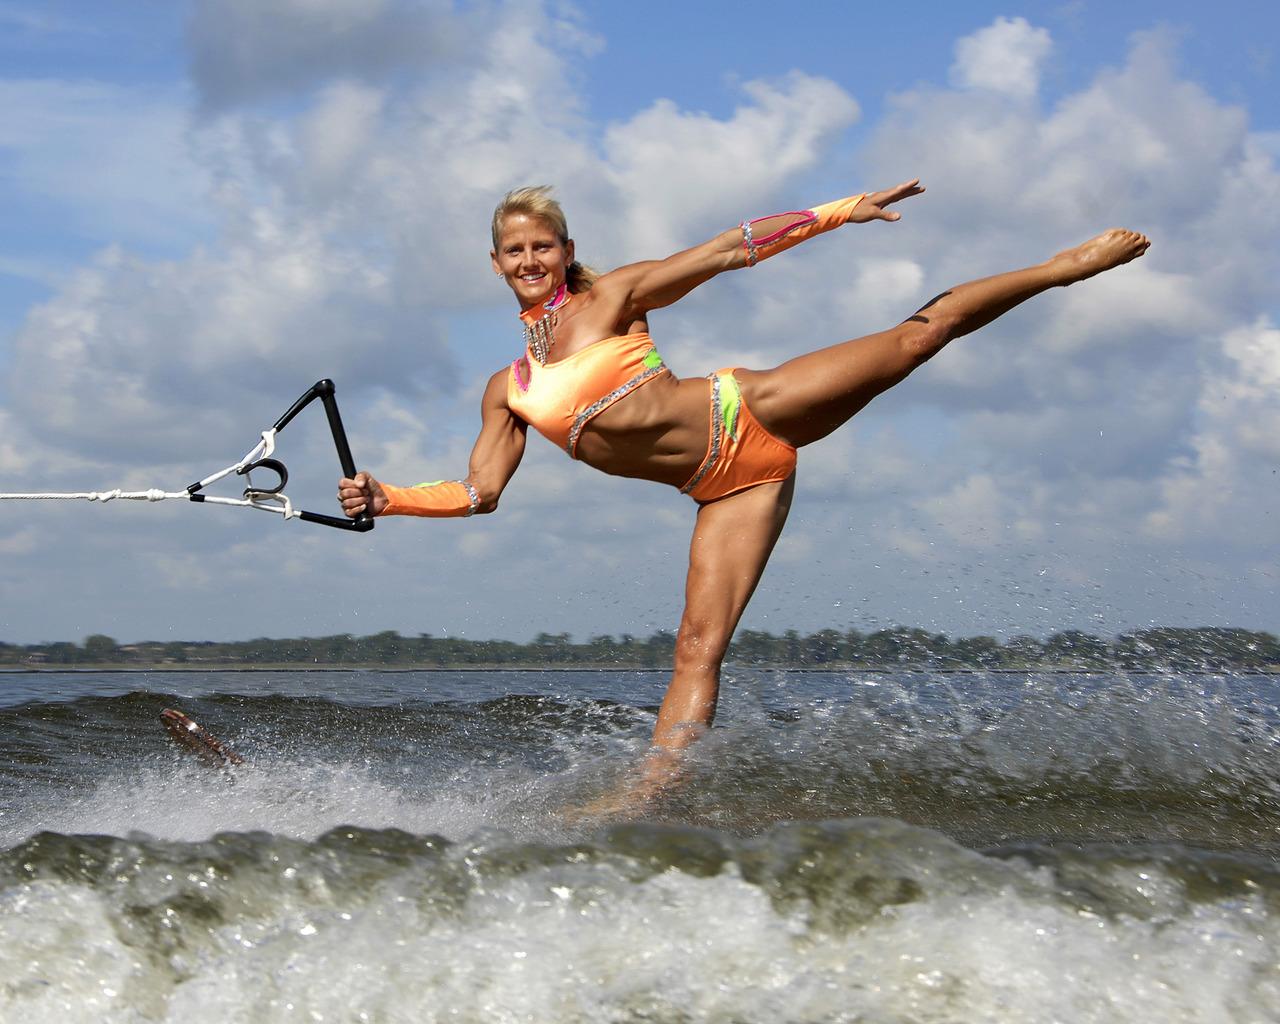 woman skiing Naked water